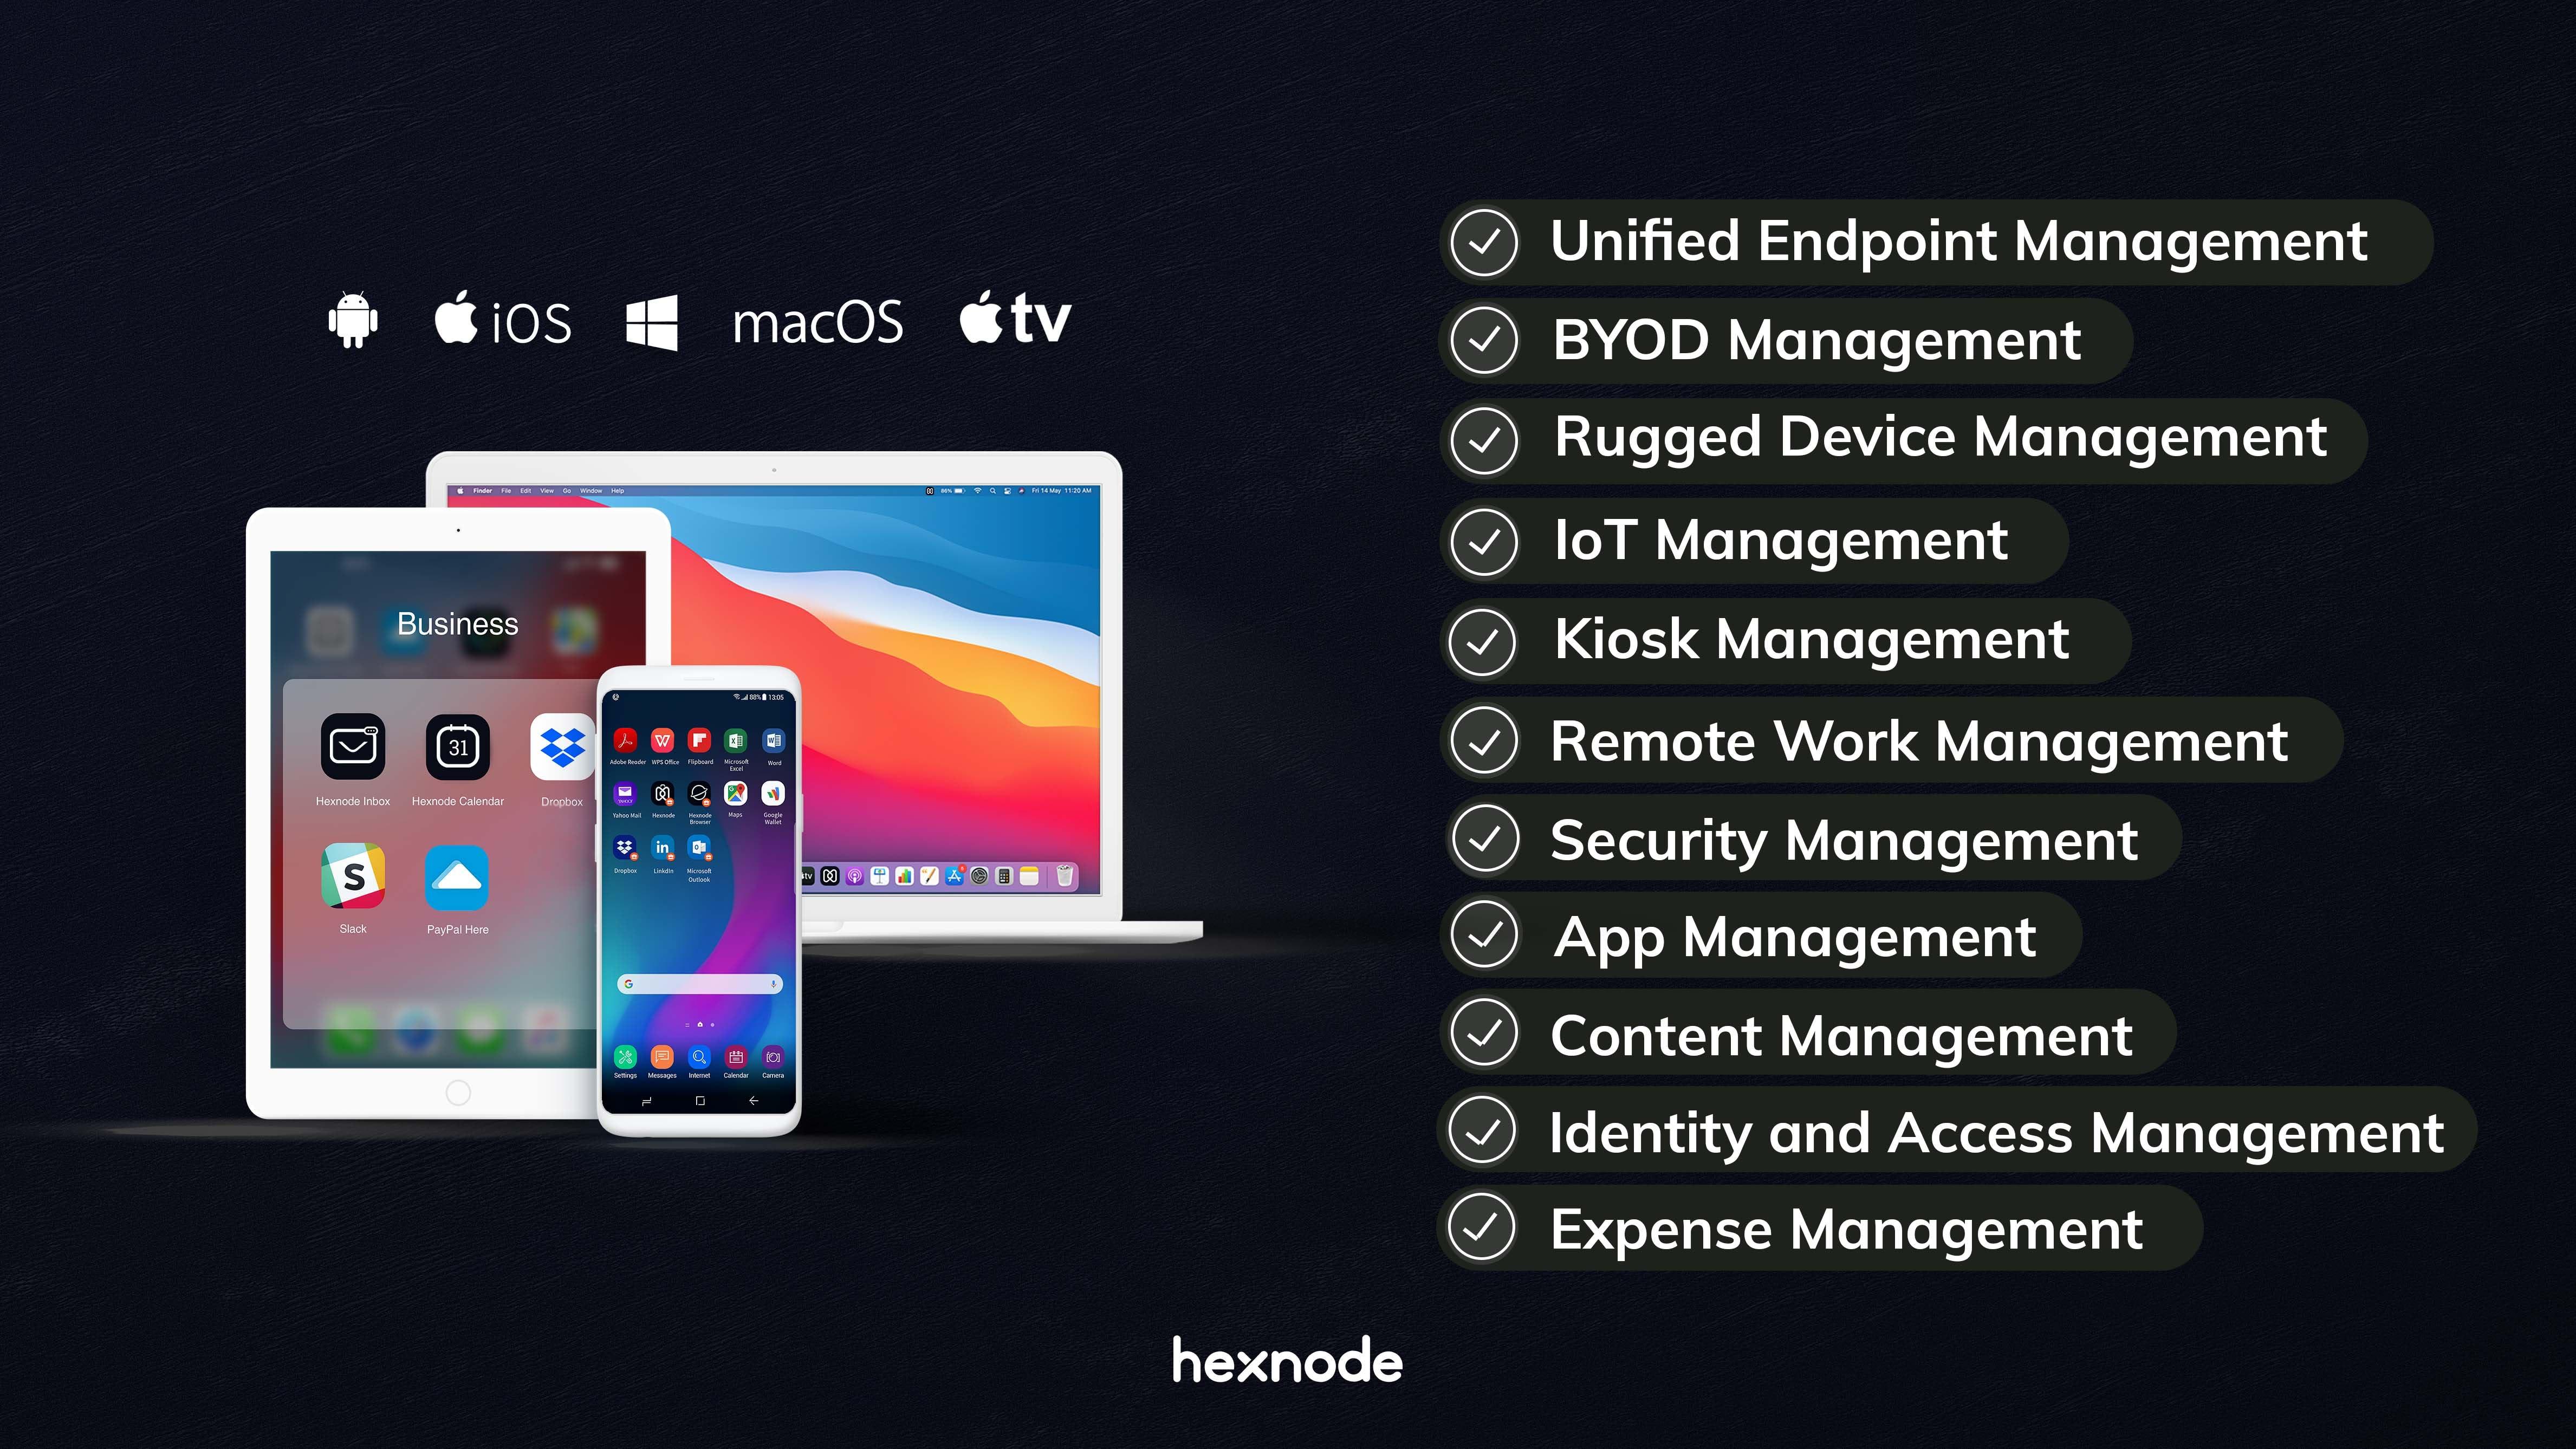 Hexnode UEM Software - Hexnode UEM Solutions